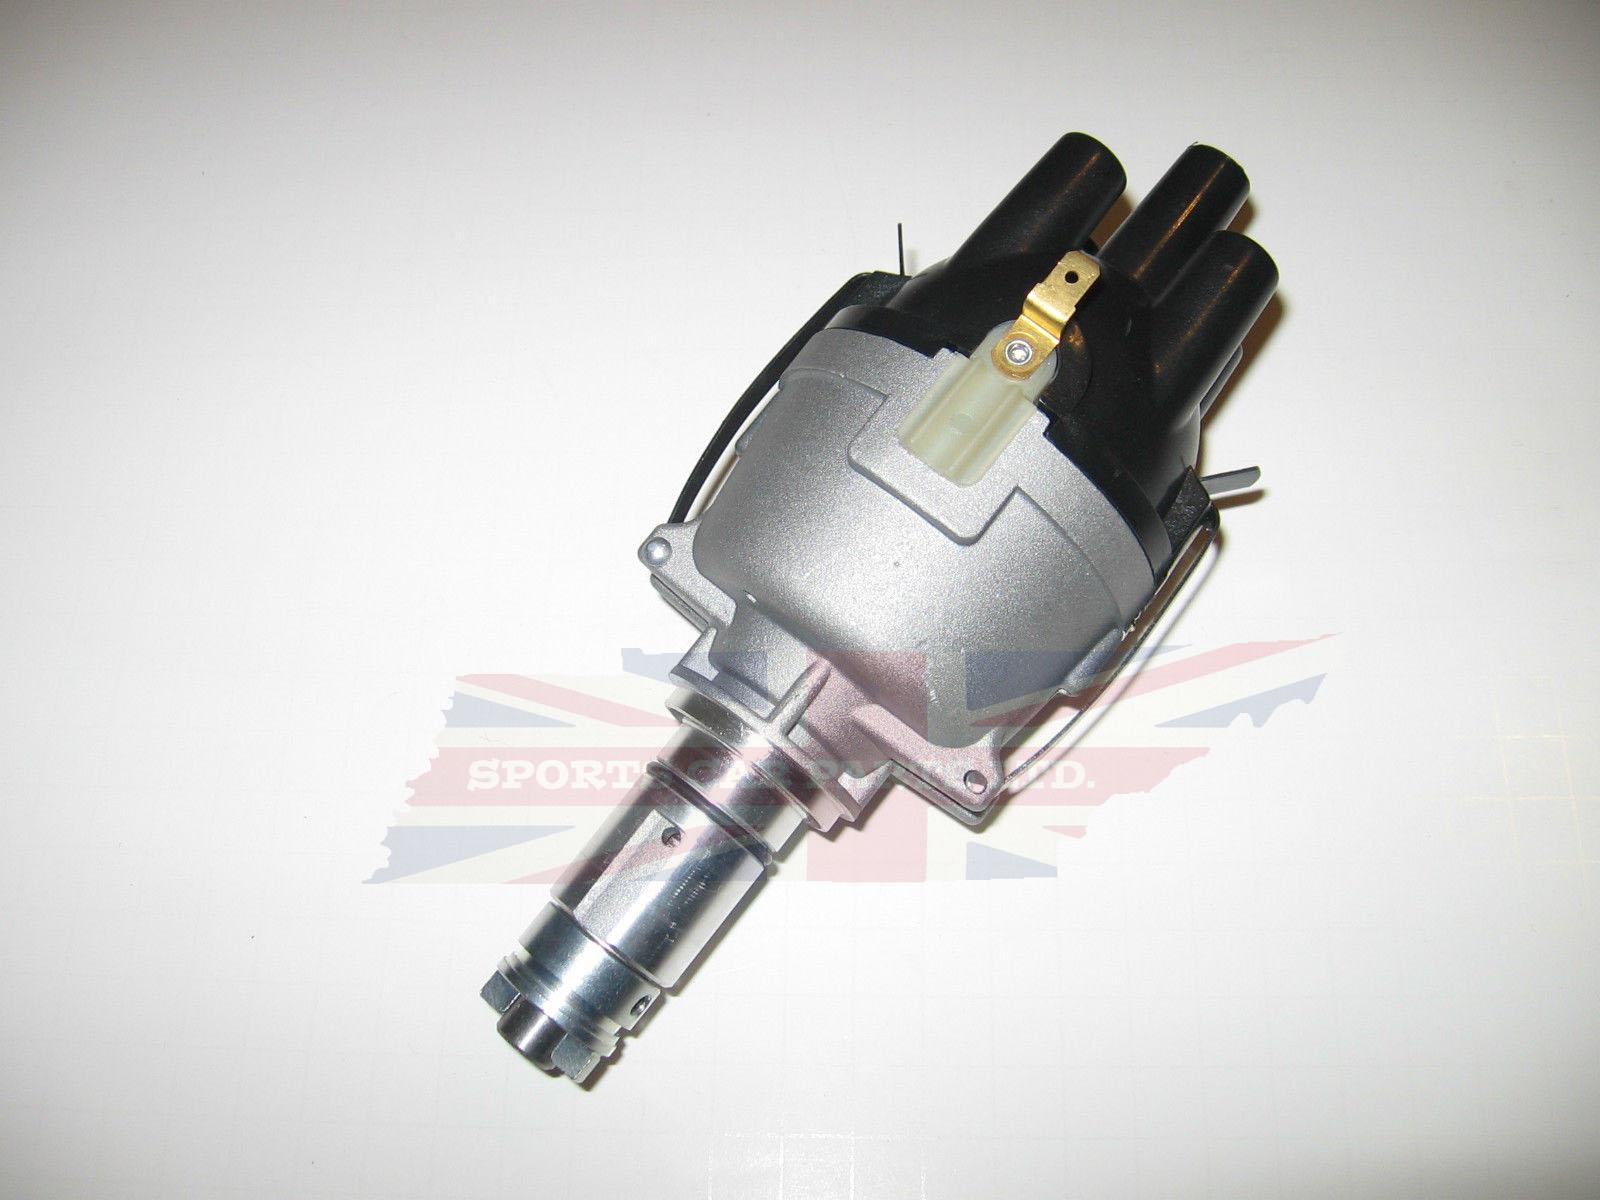 Cyl Electronic Distributor Replaces Lucas 45d Mg Mga Mgb Midget More